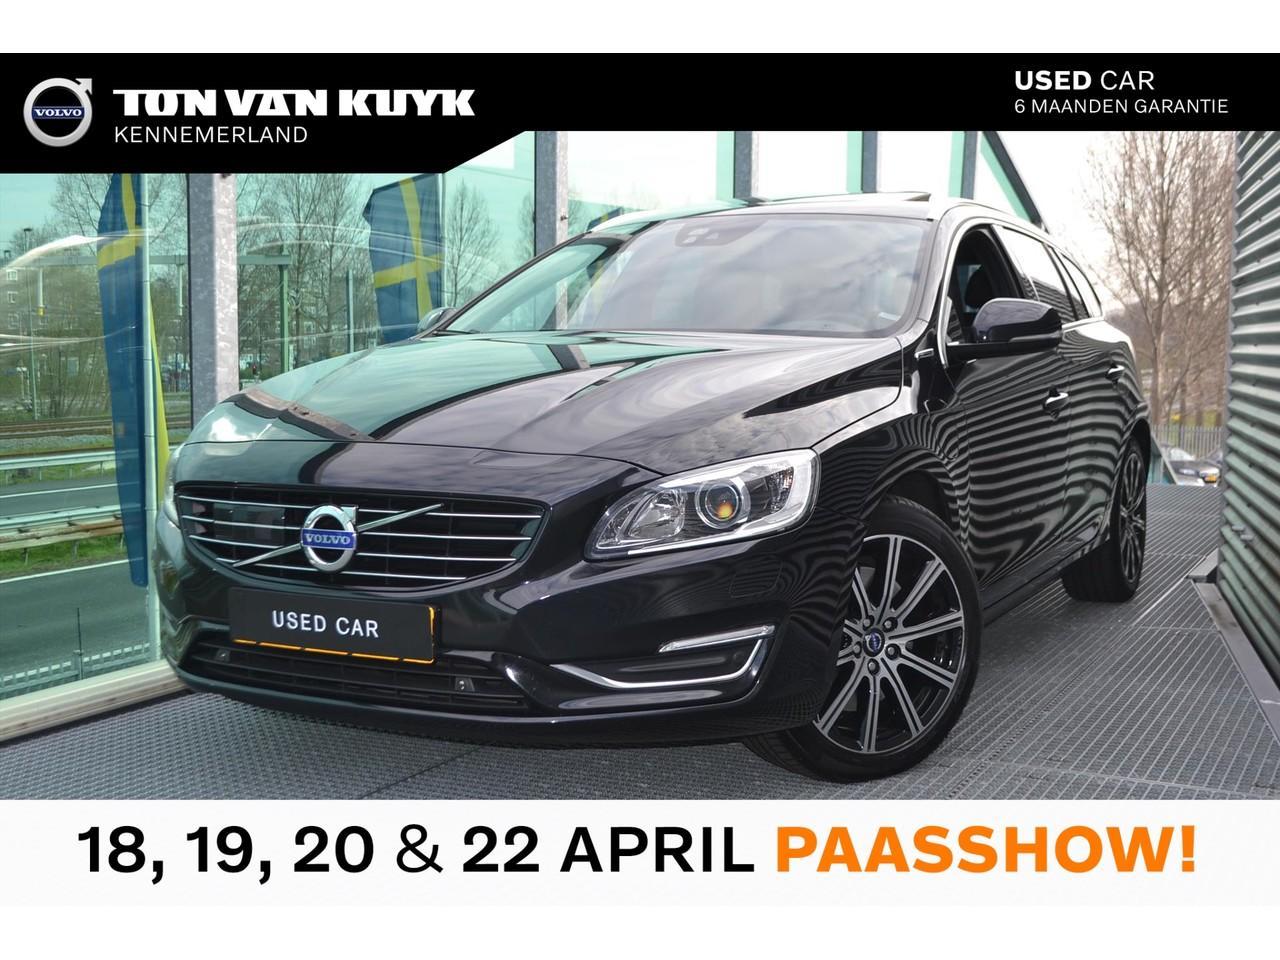 Volvo V60 D6 plug-in hybrid 285pk geartronic awd sum / intellisafe / famil